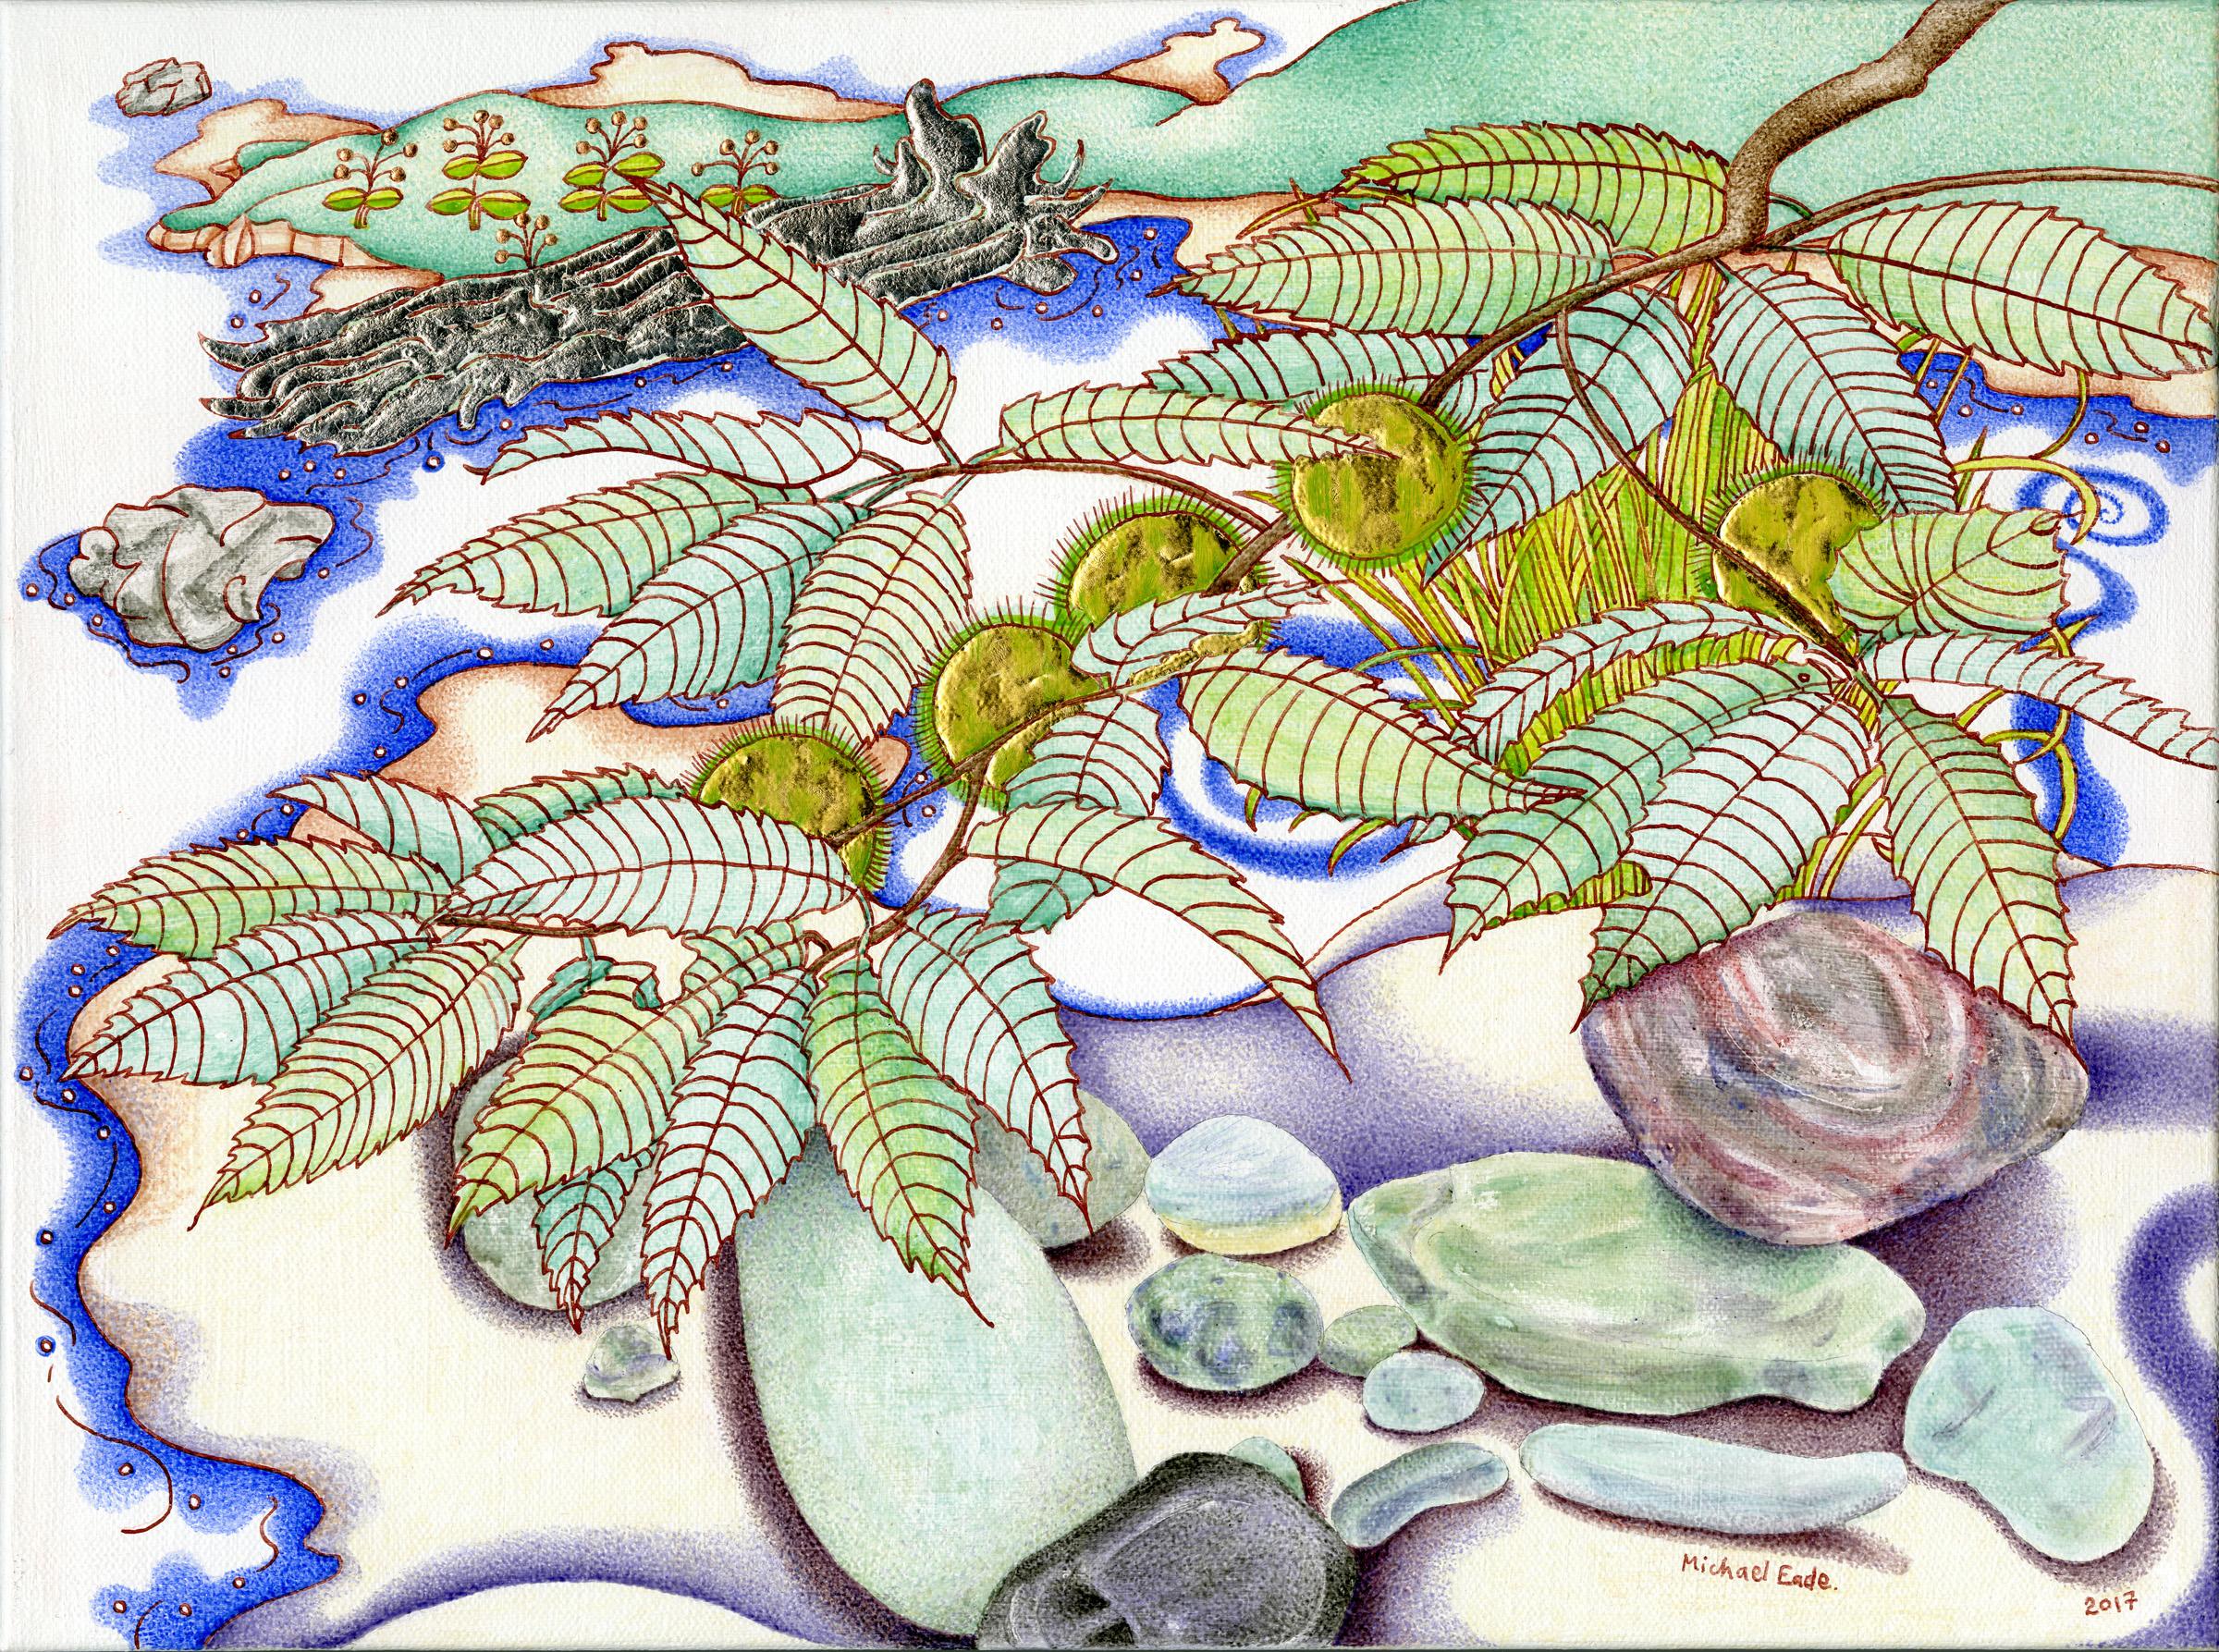 Michael Eade.  Gilded Chestnut 金栗树 , Egg Tempera, raised 22k gold leaf, raised copper and aluminum leaf on canvas, 12 x 16 in.(30.4 x 40.6 cm),2016.